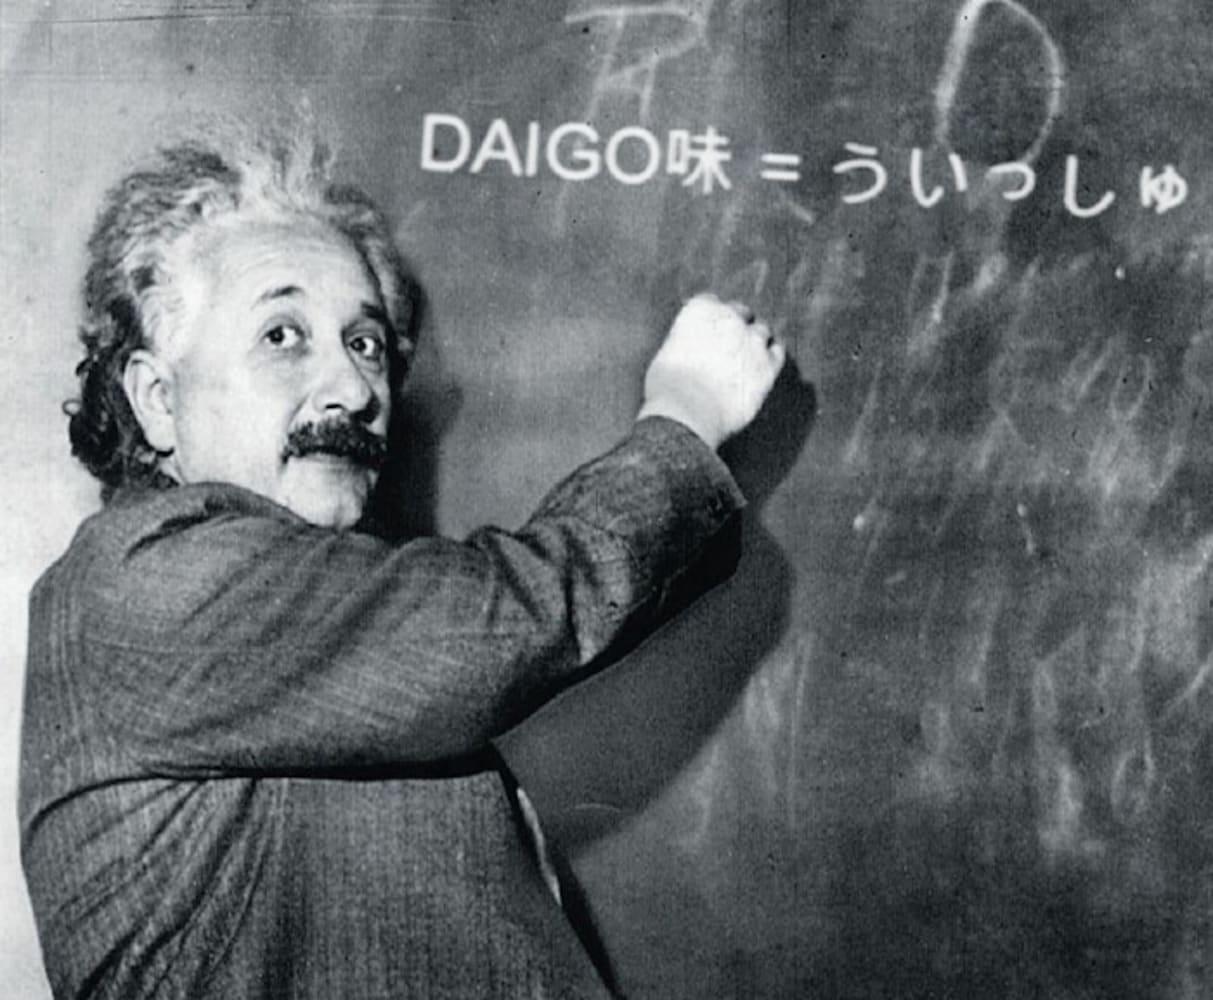 daigomi